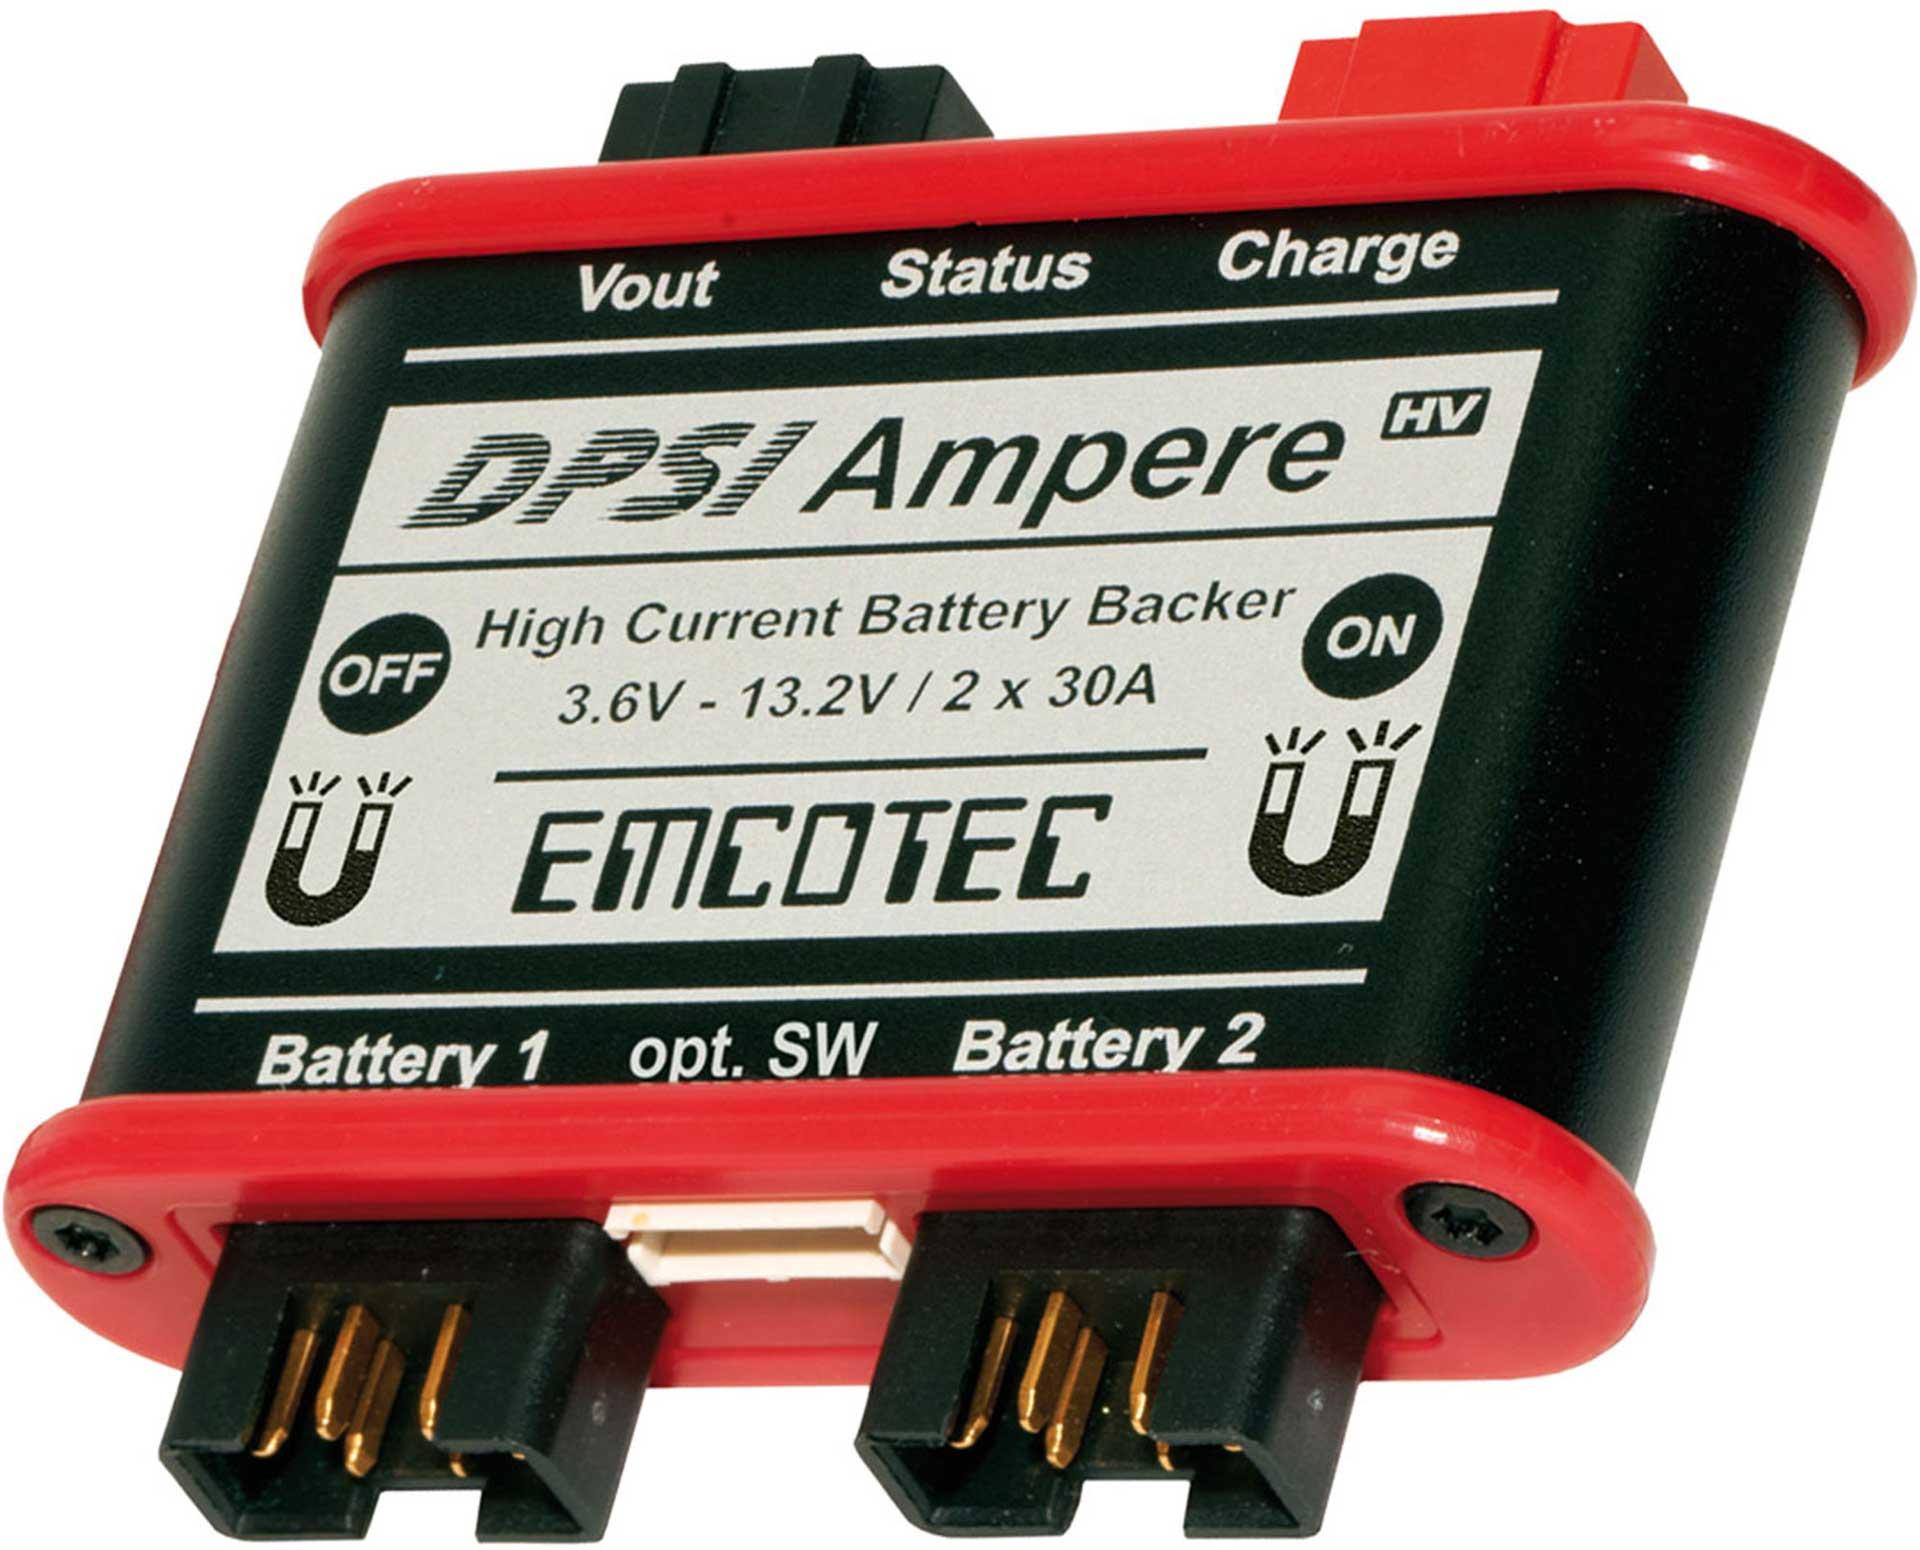 EMCOTEC DPSI AMPERE AKKUWEICHE -60A